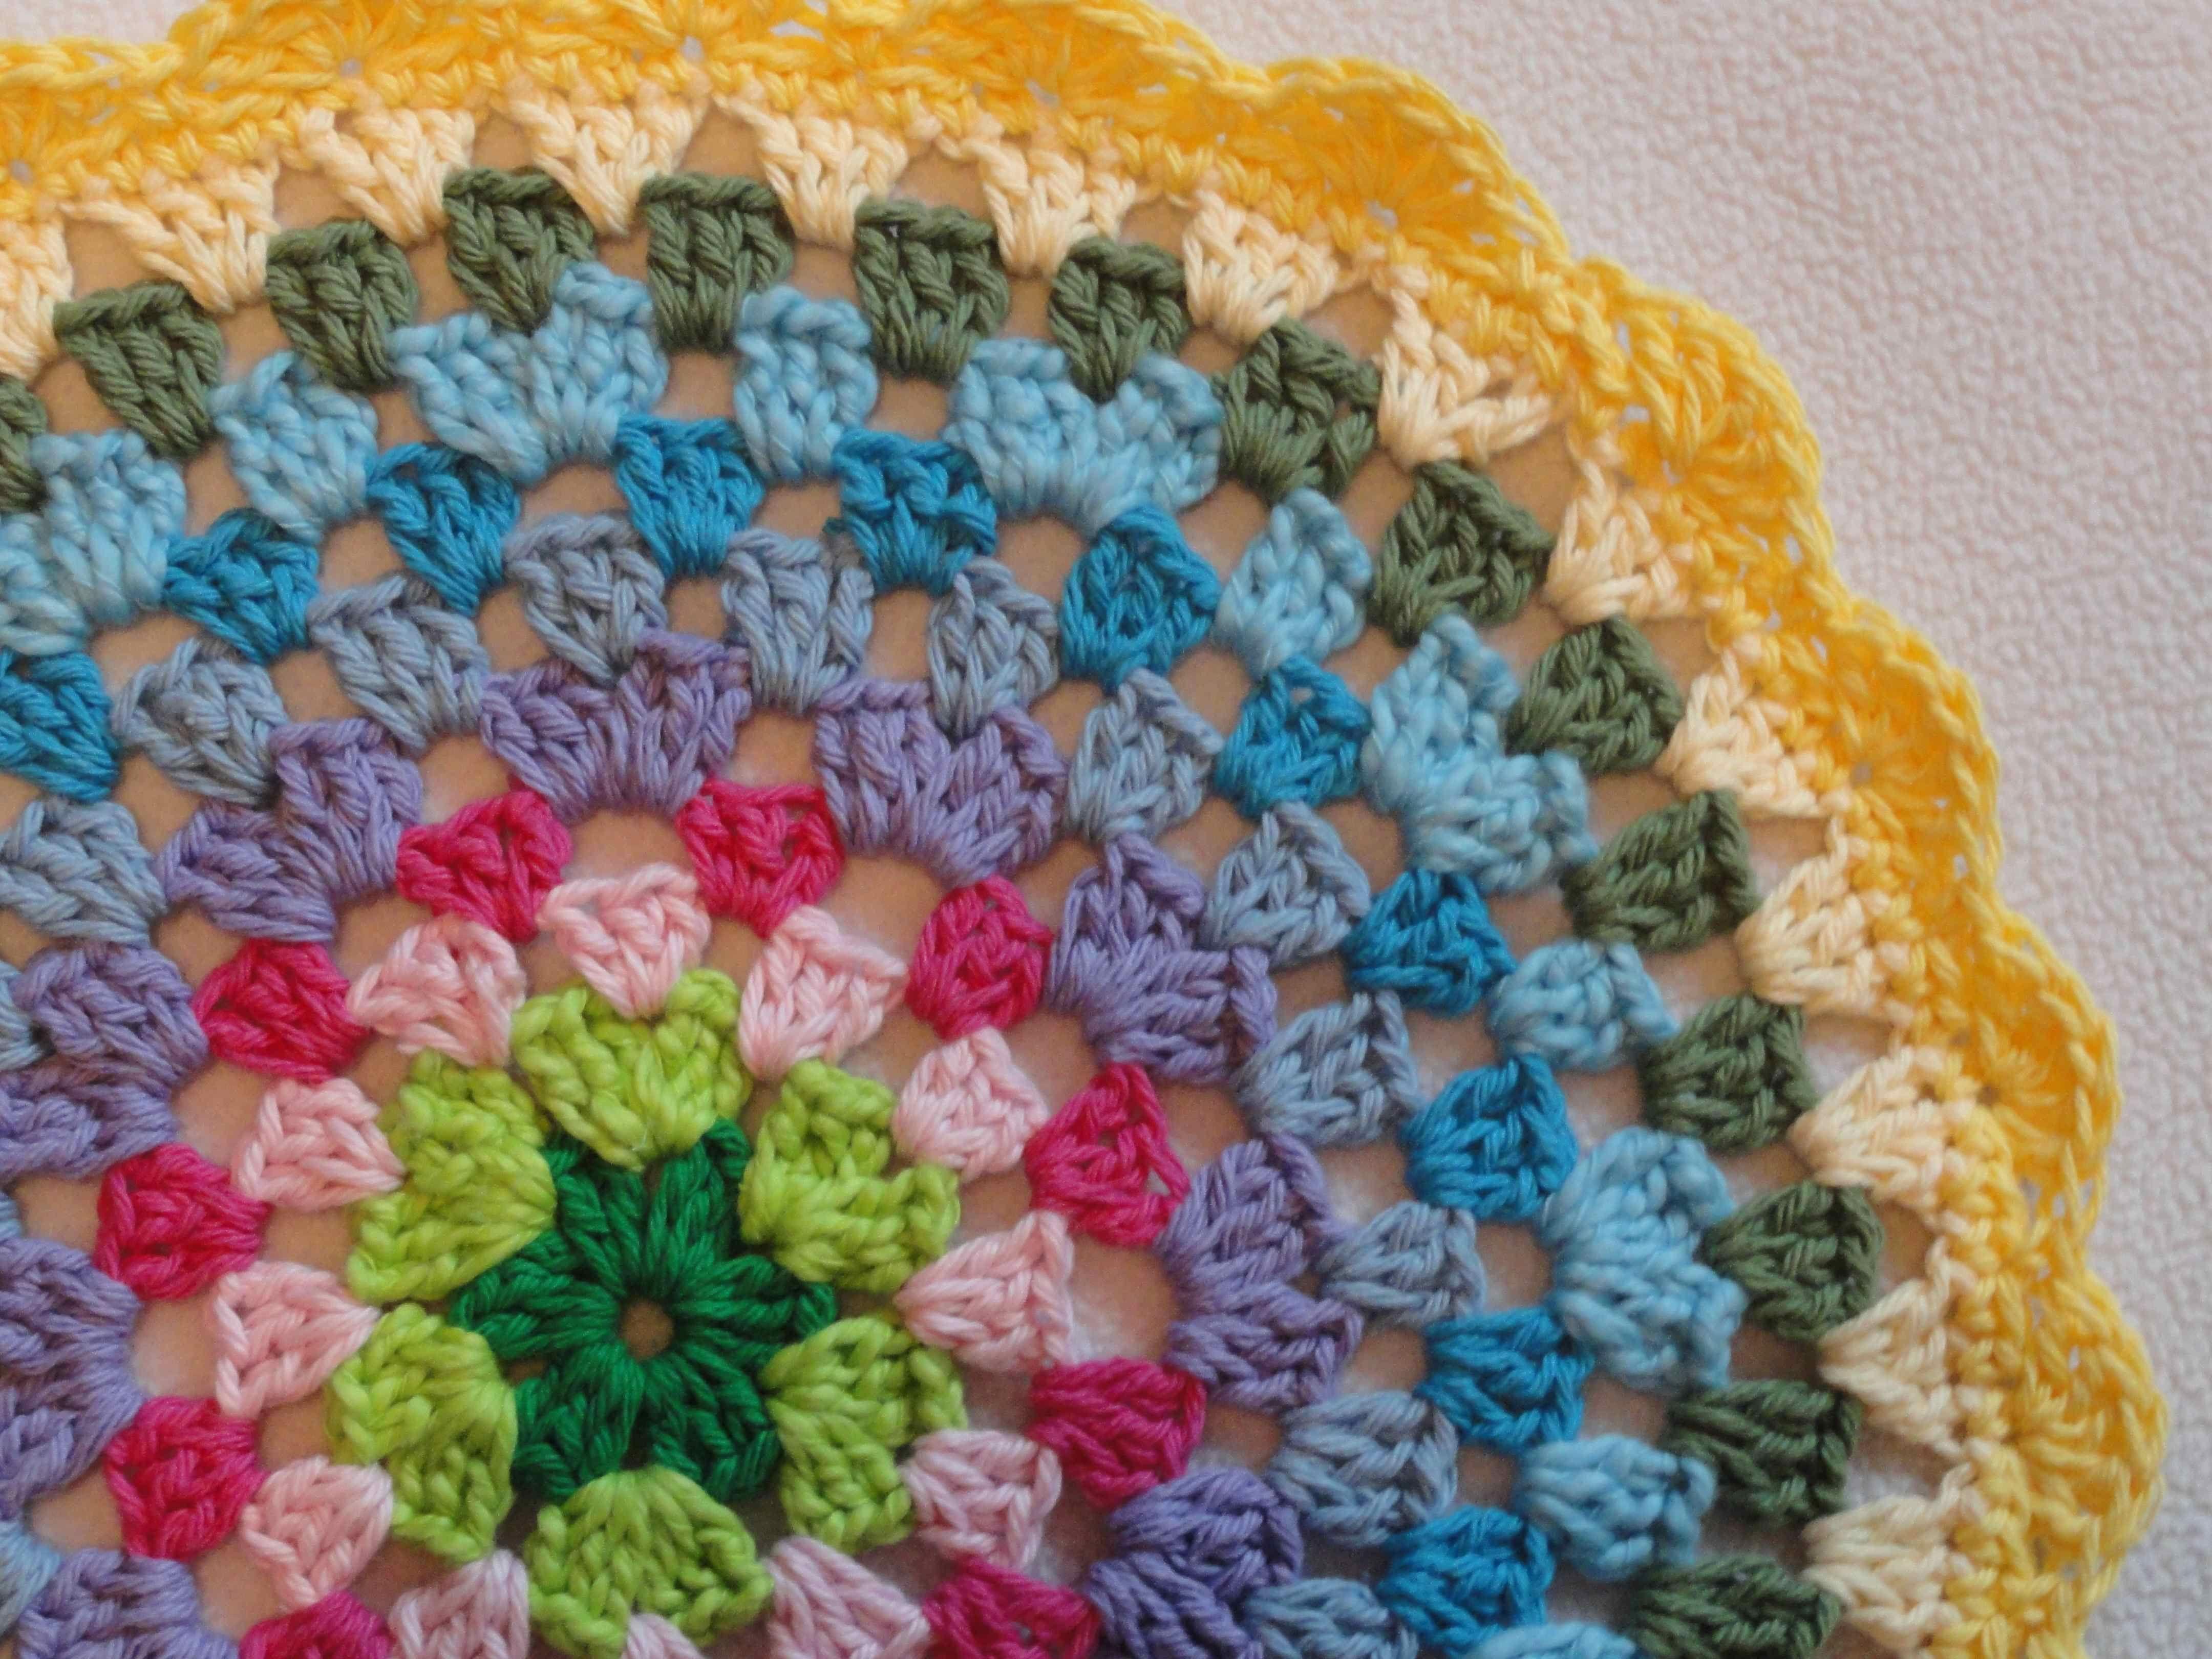 Crochet Granny Circle Grannys Of Sorts Crochet Circle Pattern